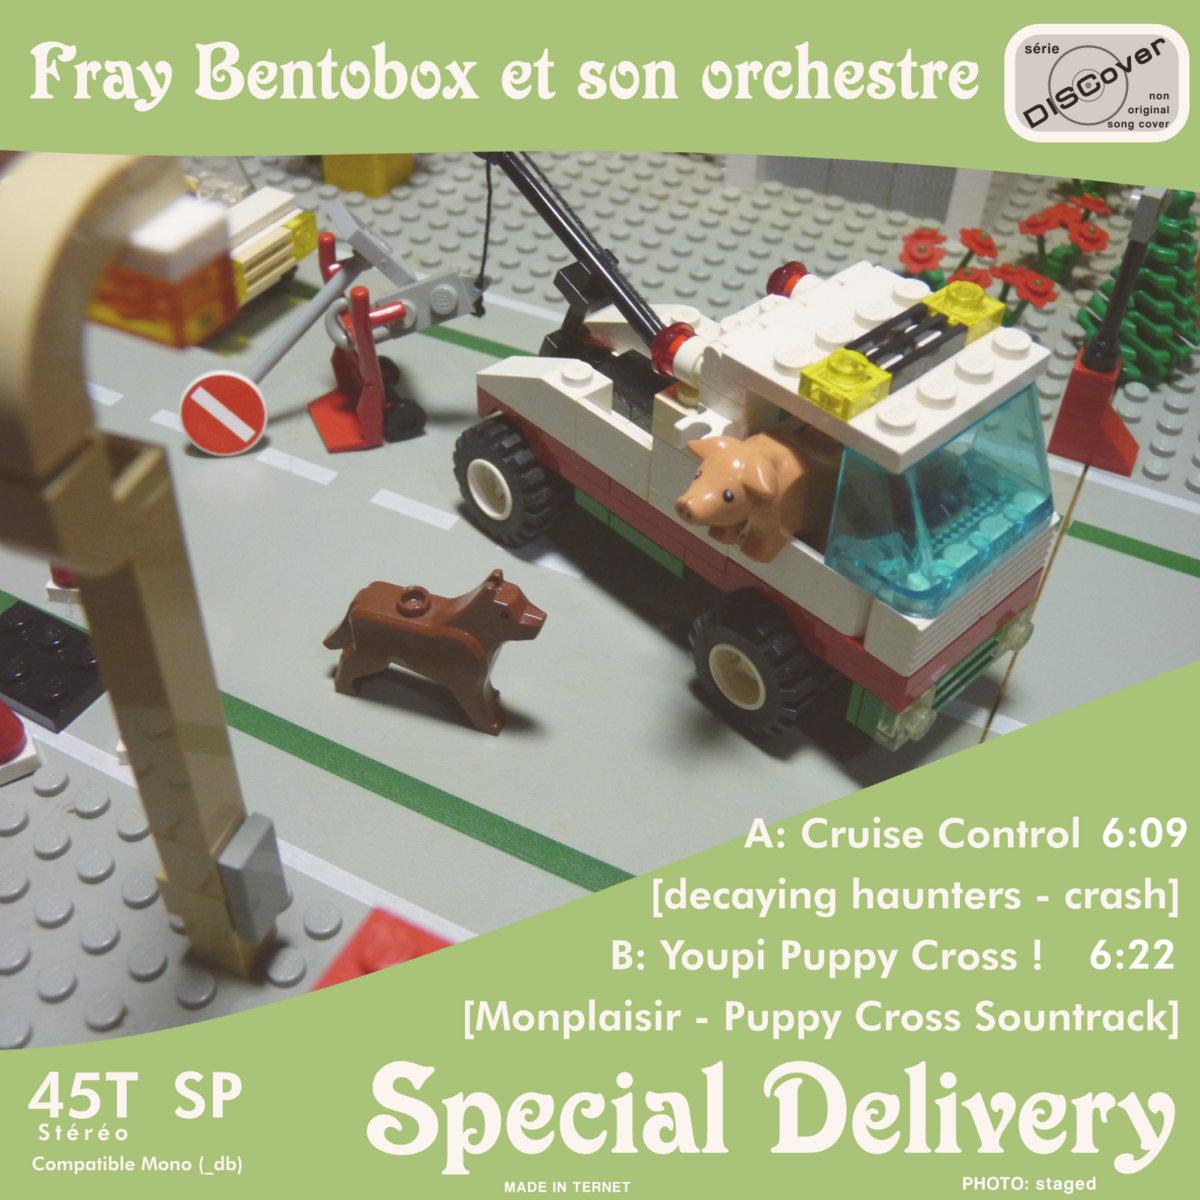 Fray Bentobox et son orchestre – Special Delivery